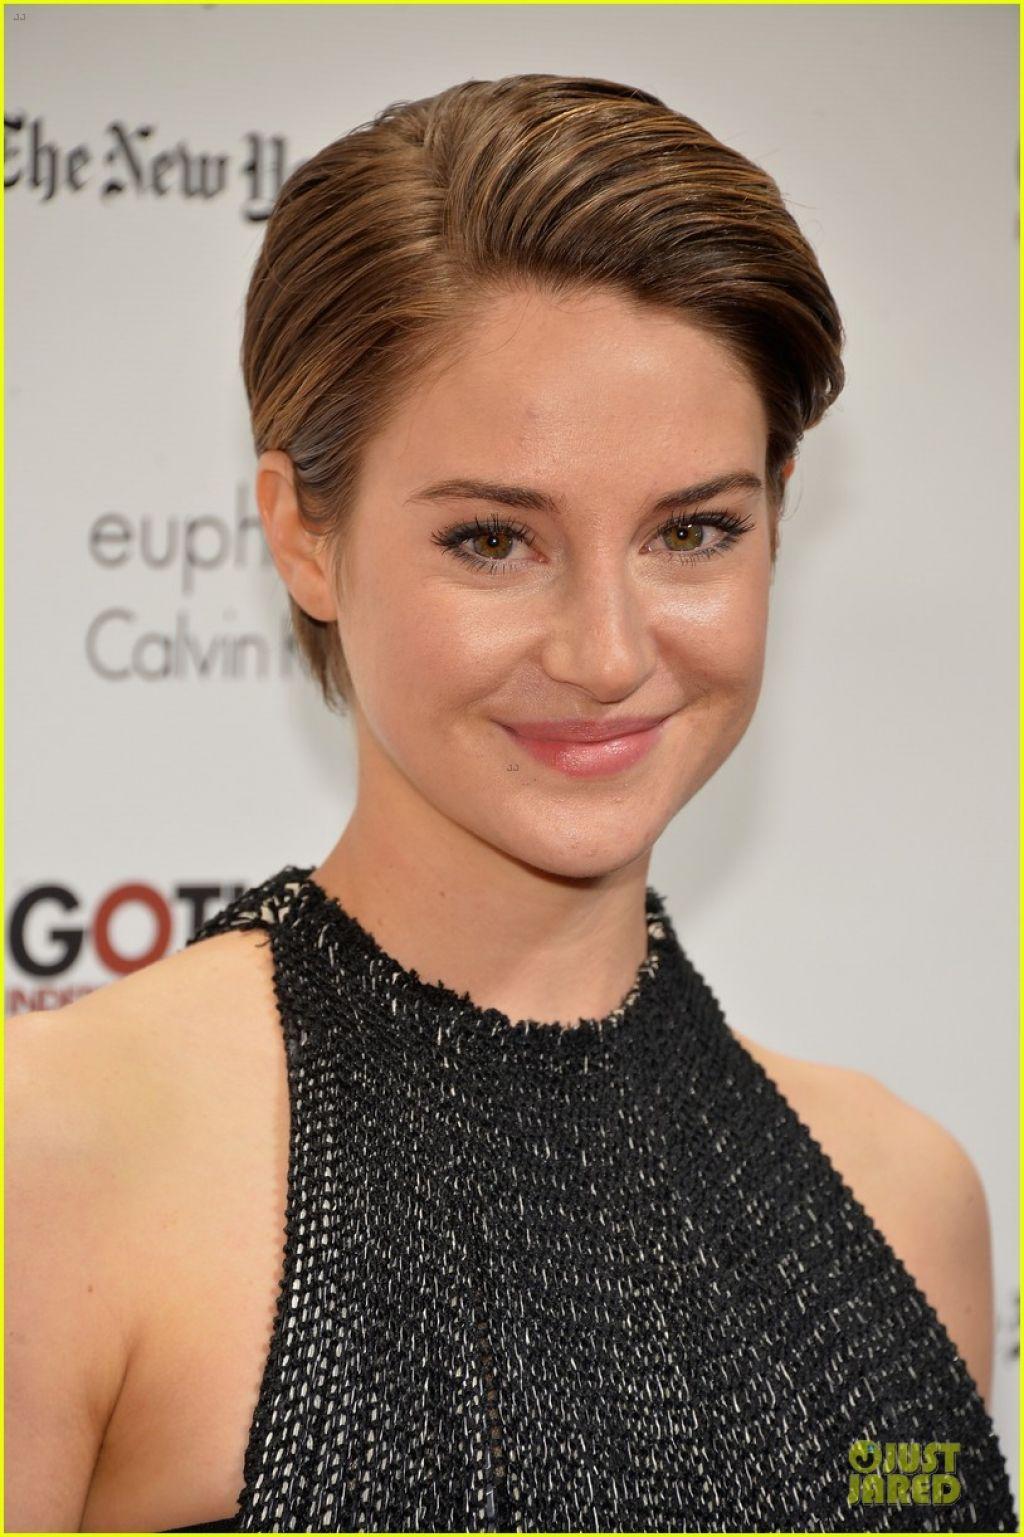 Shailene Woodley Red Carpet Photos - 2013 Gotham Independent Film Awards in New York City